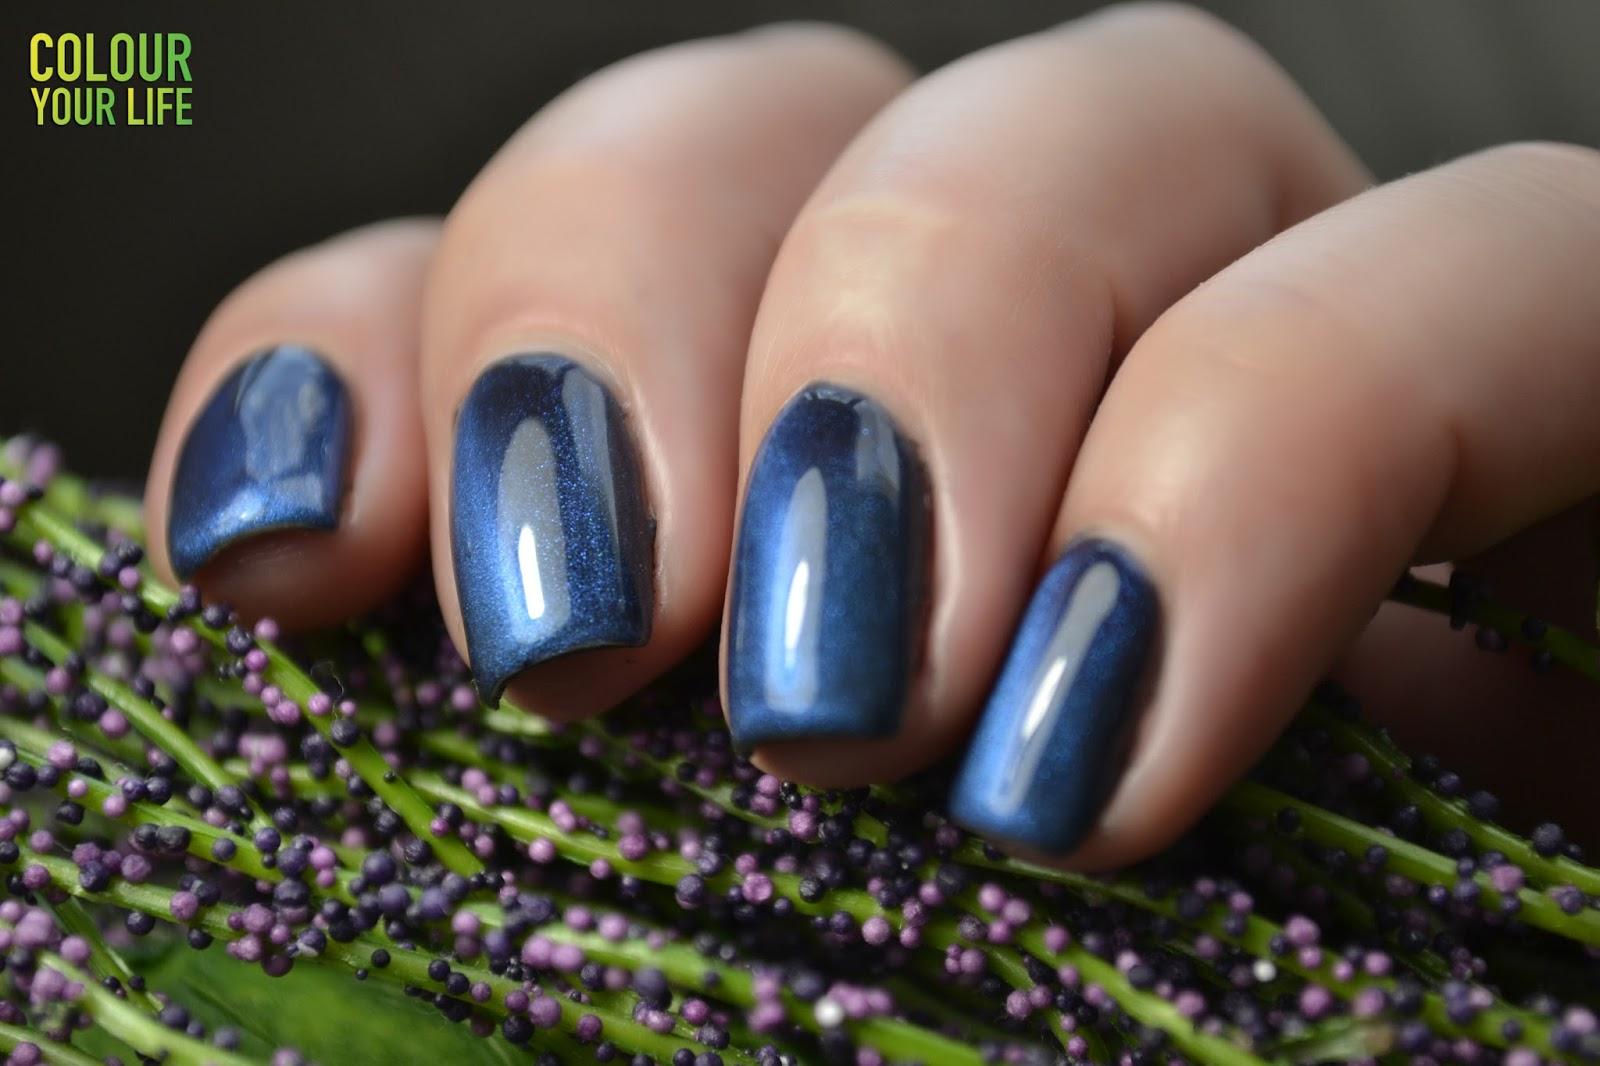 Colour your life: Soak-off cat eye nail polish review